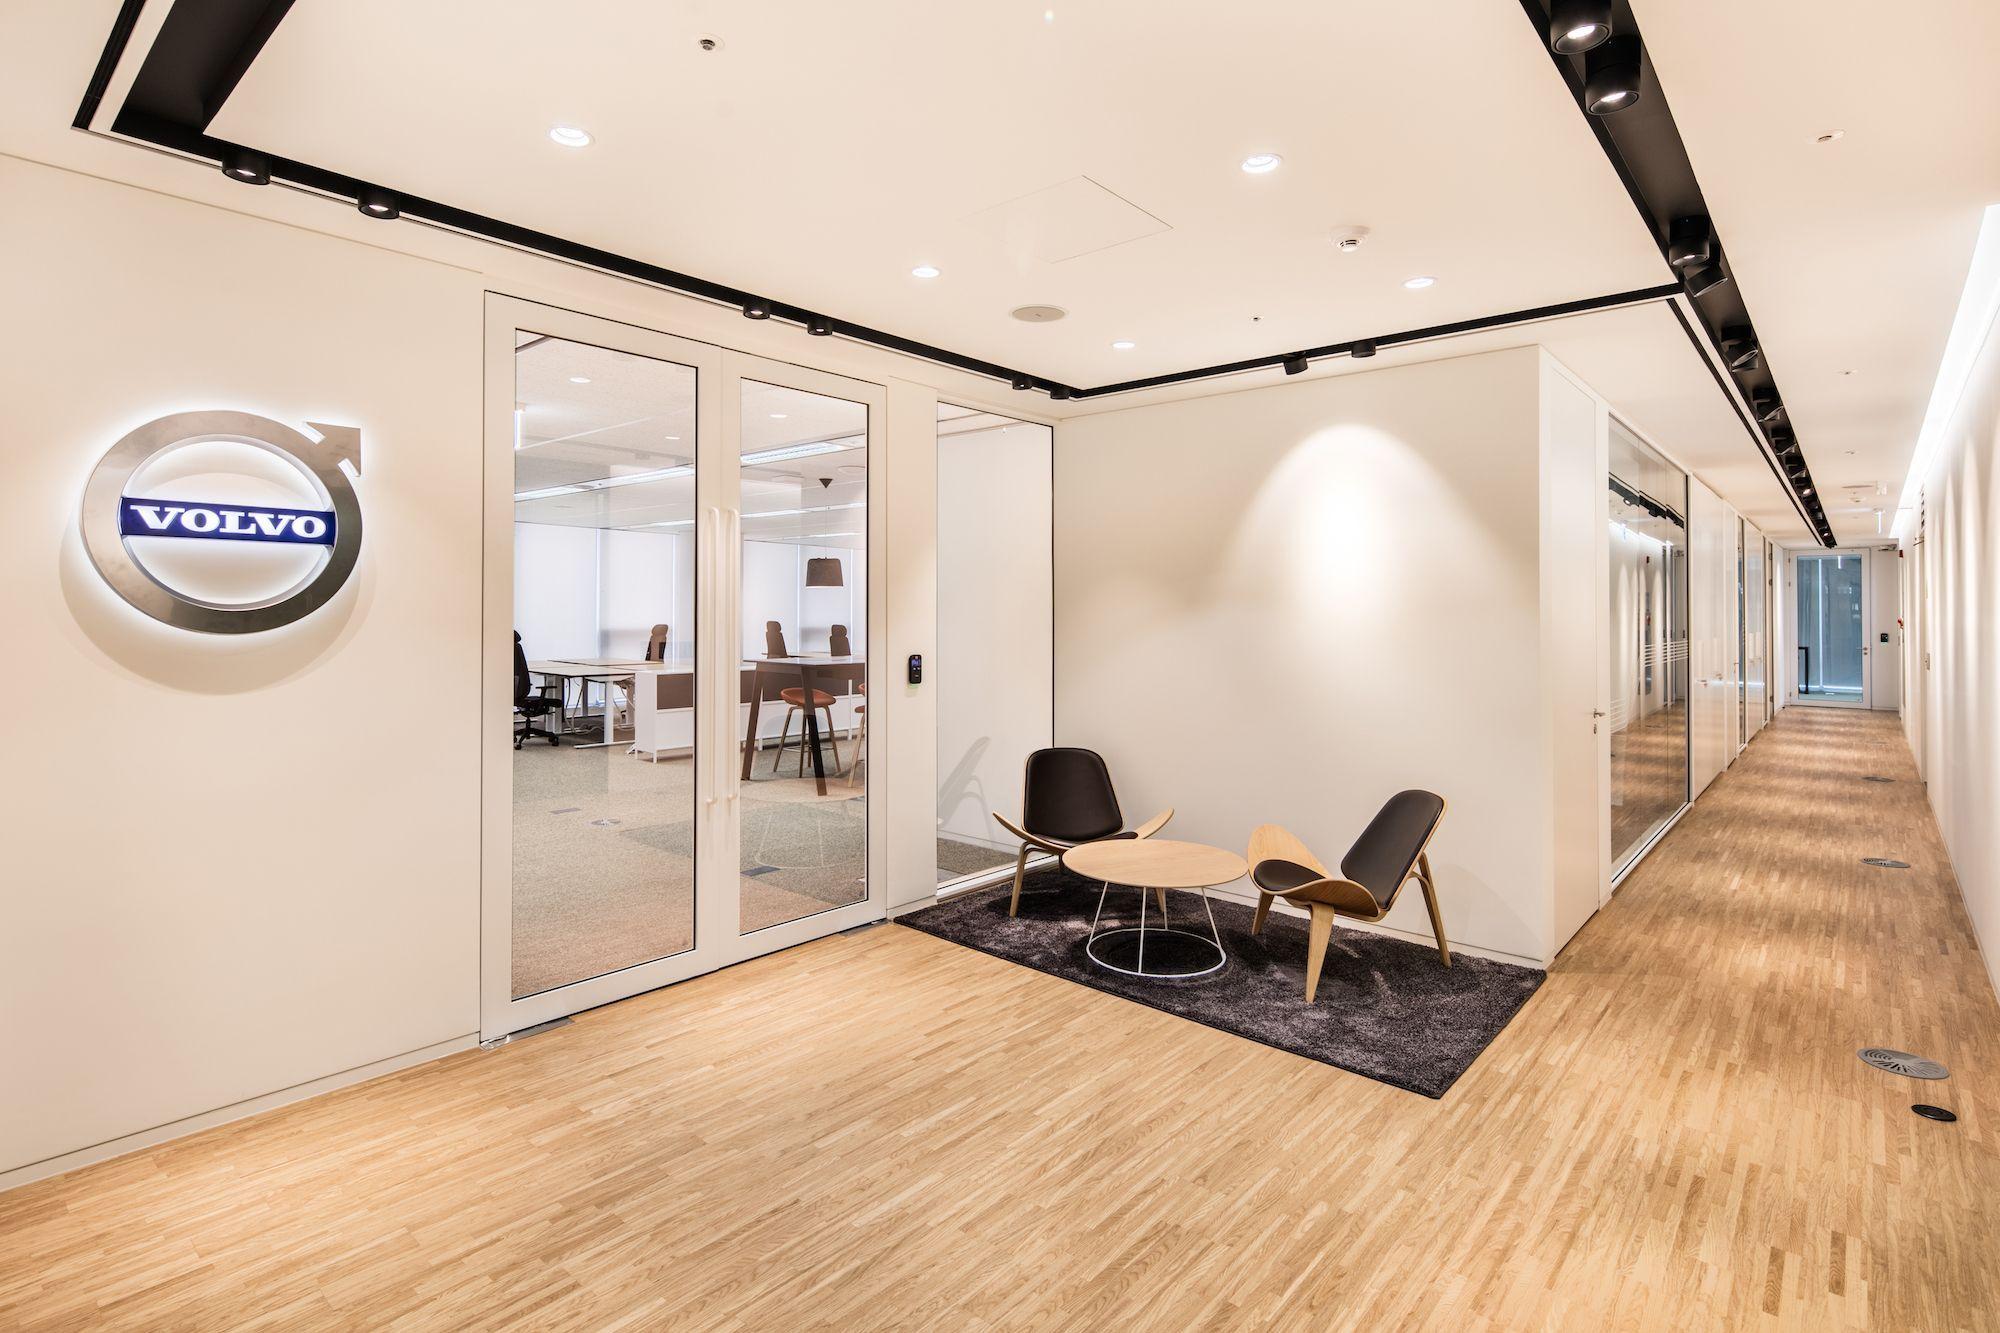 Volvo Car Group offices in Seoul, Korea. Interior design